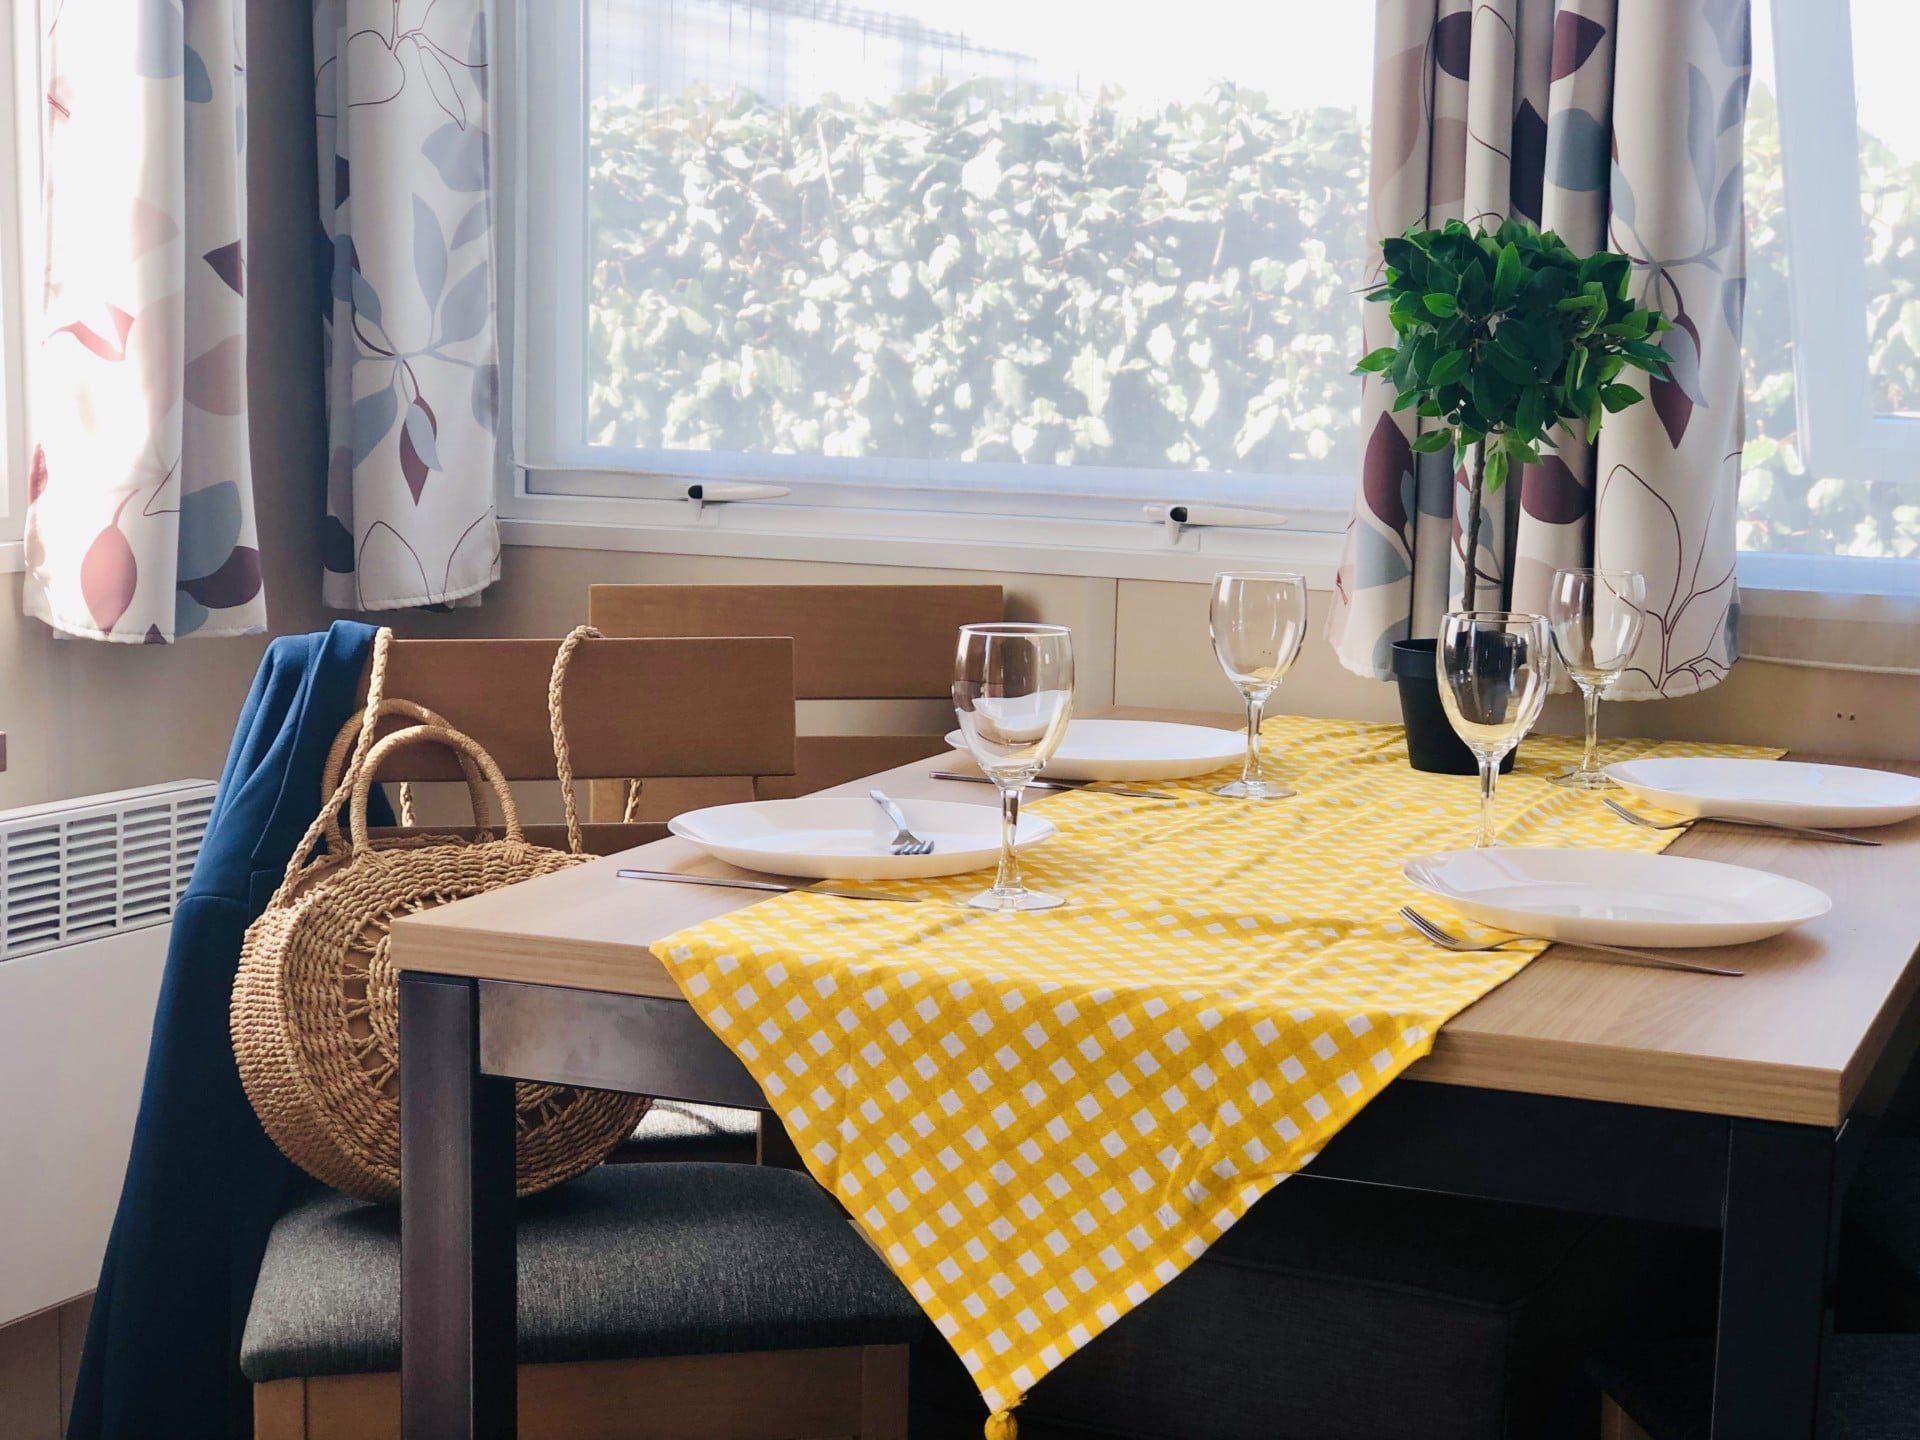 MOBIL HOME 9 CAMPING PORT BLANC DINARD SALON TABLE 2